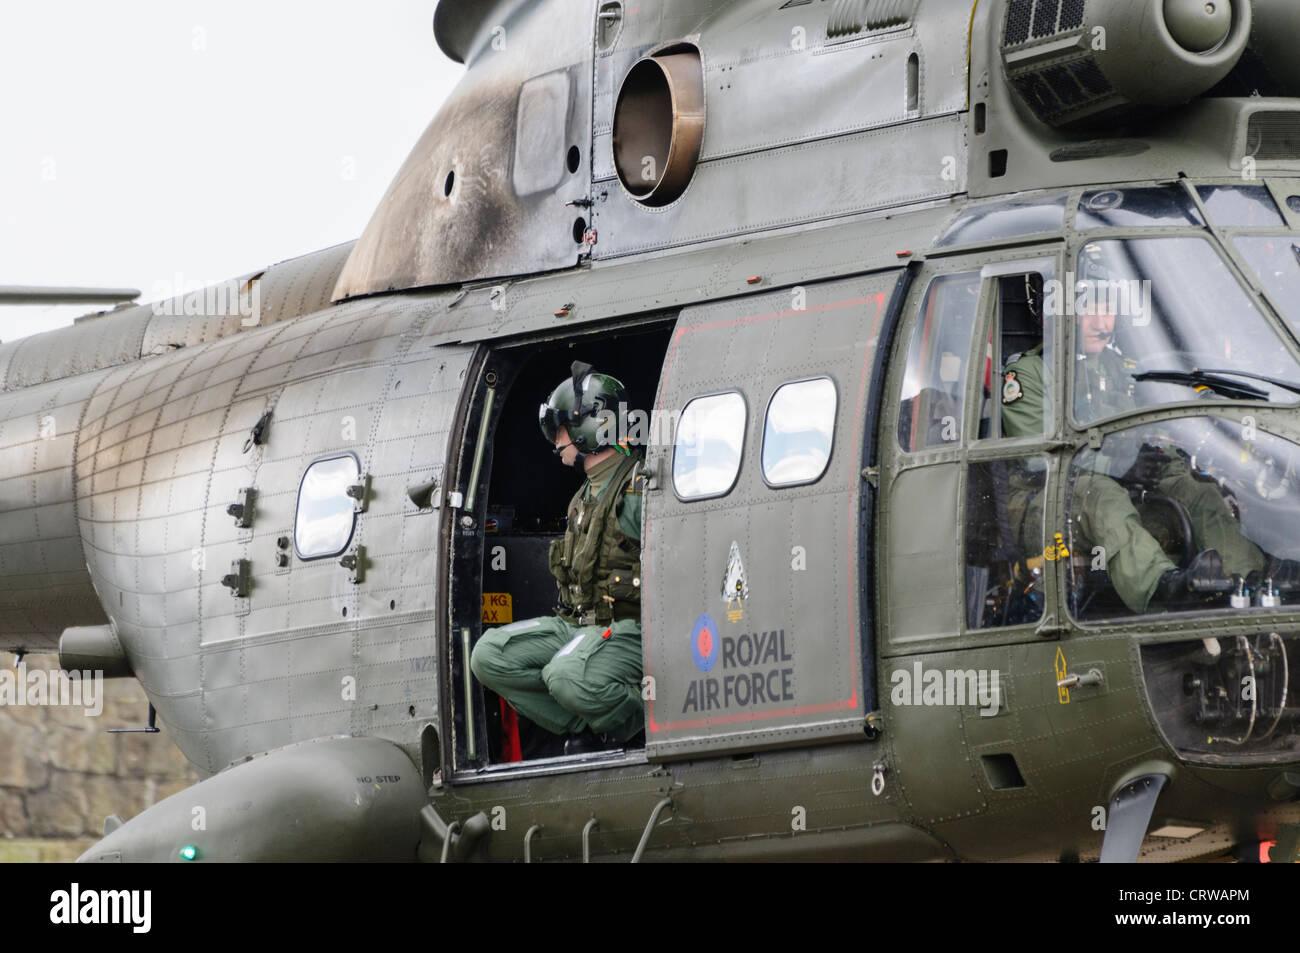 Doorman and pilot of a Royal Air Force Puma - Stock Image